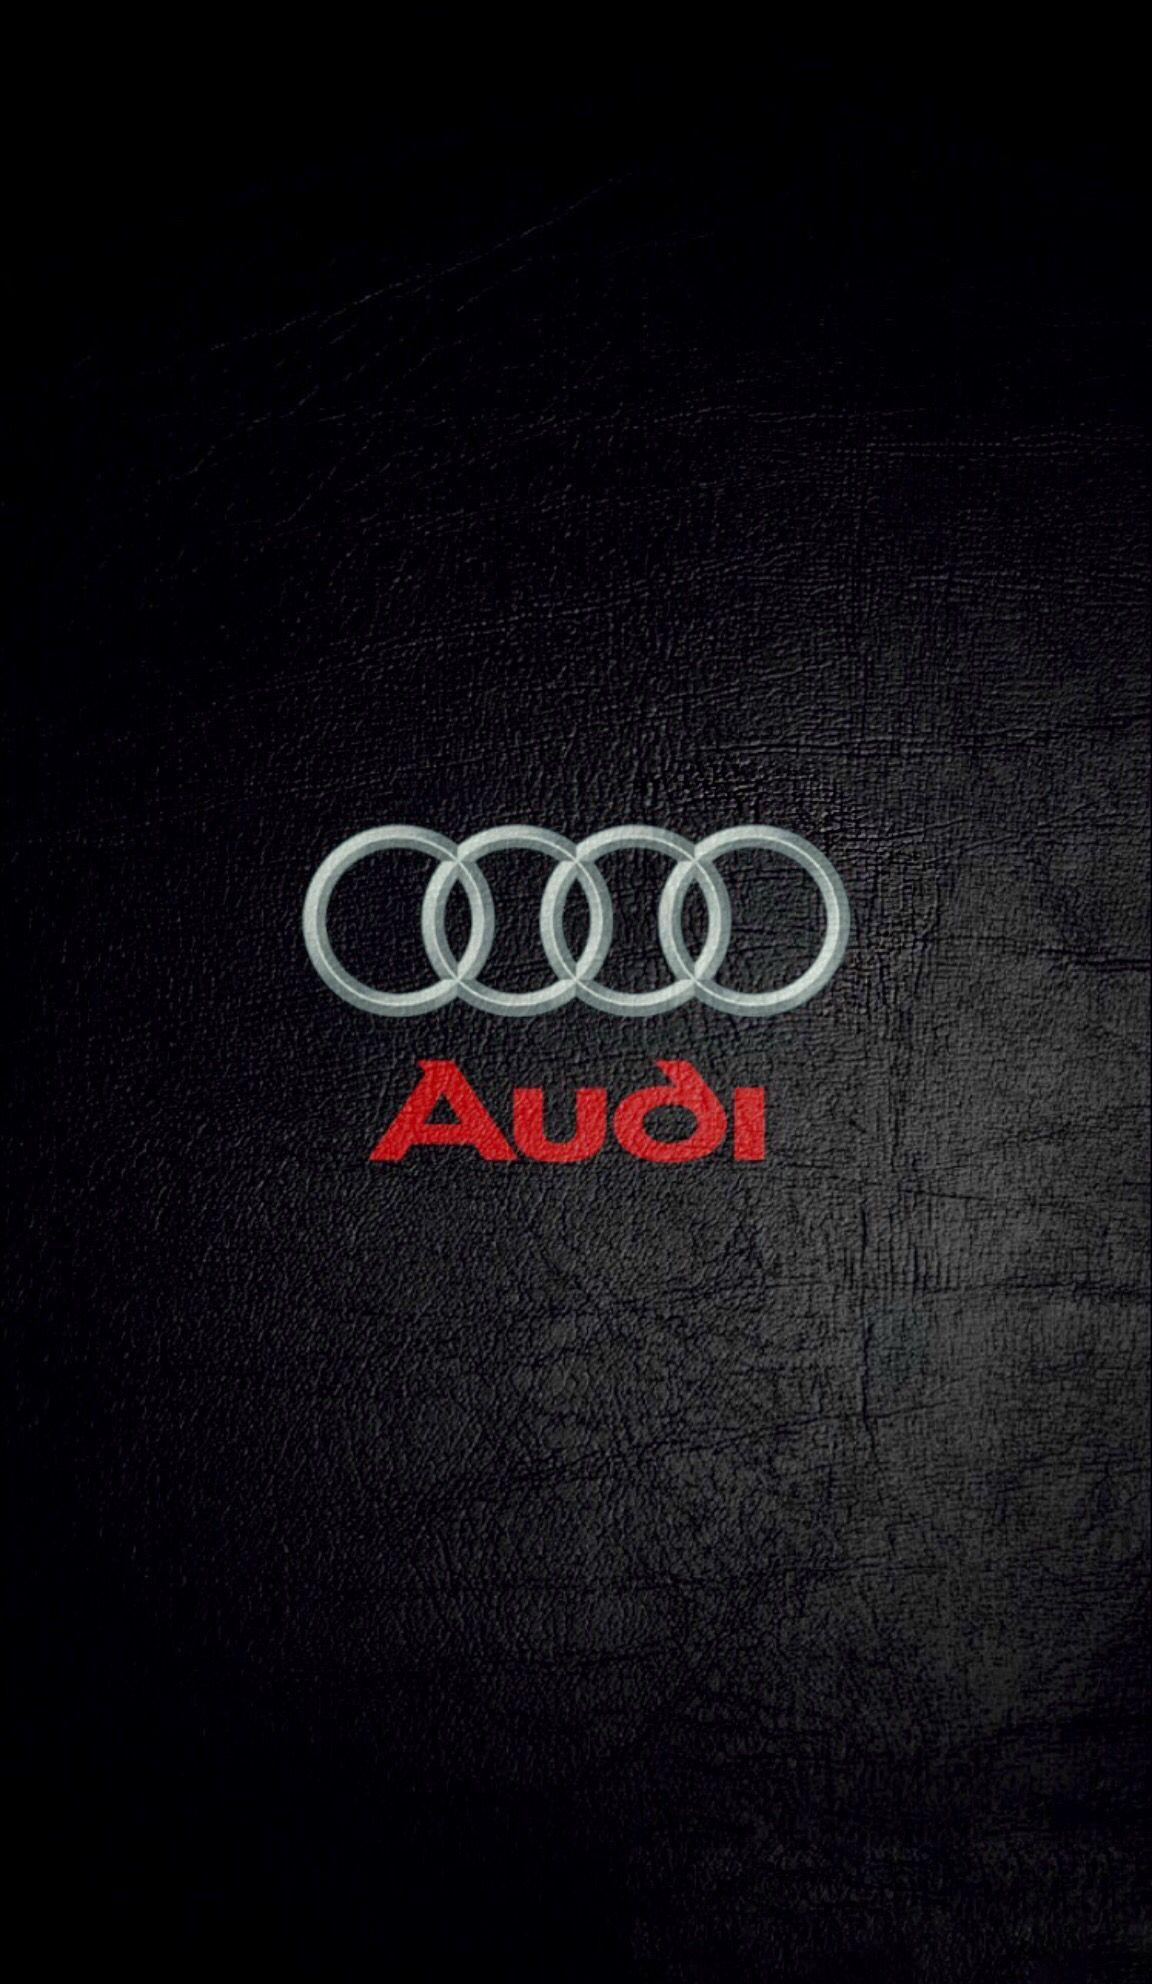 Audi Iphone壁紙 Audi 壁紙 Iphone 背景 背景画像 Audi Cars Modified Wallpaper Iphone壁紙 In Iphone Wallpaper Luxury Car Logos Sports Car Wallpaper